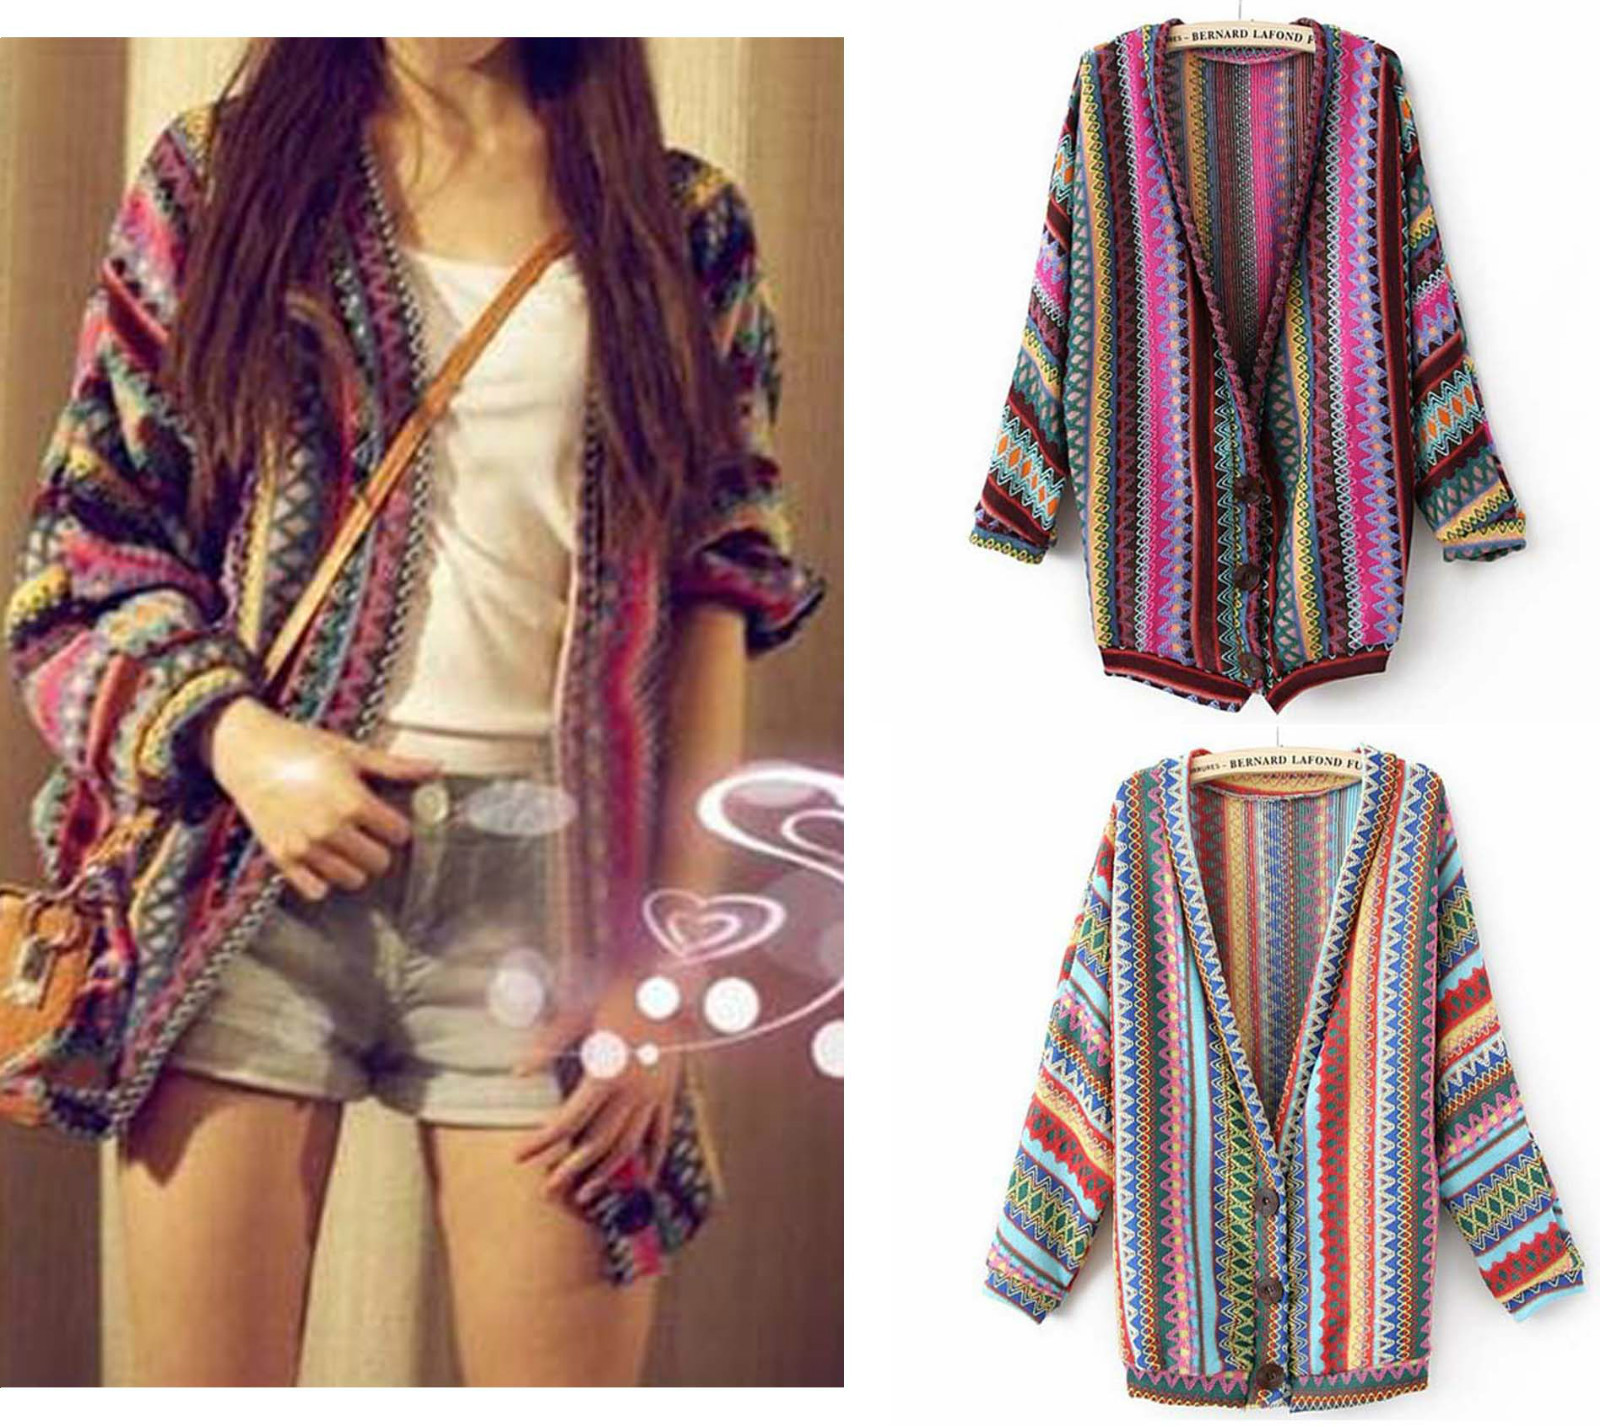 d90cc6e3fc5a Boho Knitting Sweater Oversized Cardigan · Mad Bargains · Online ...